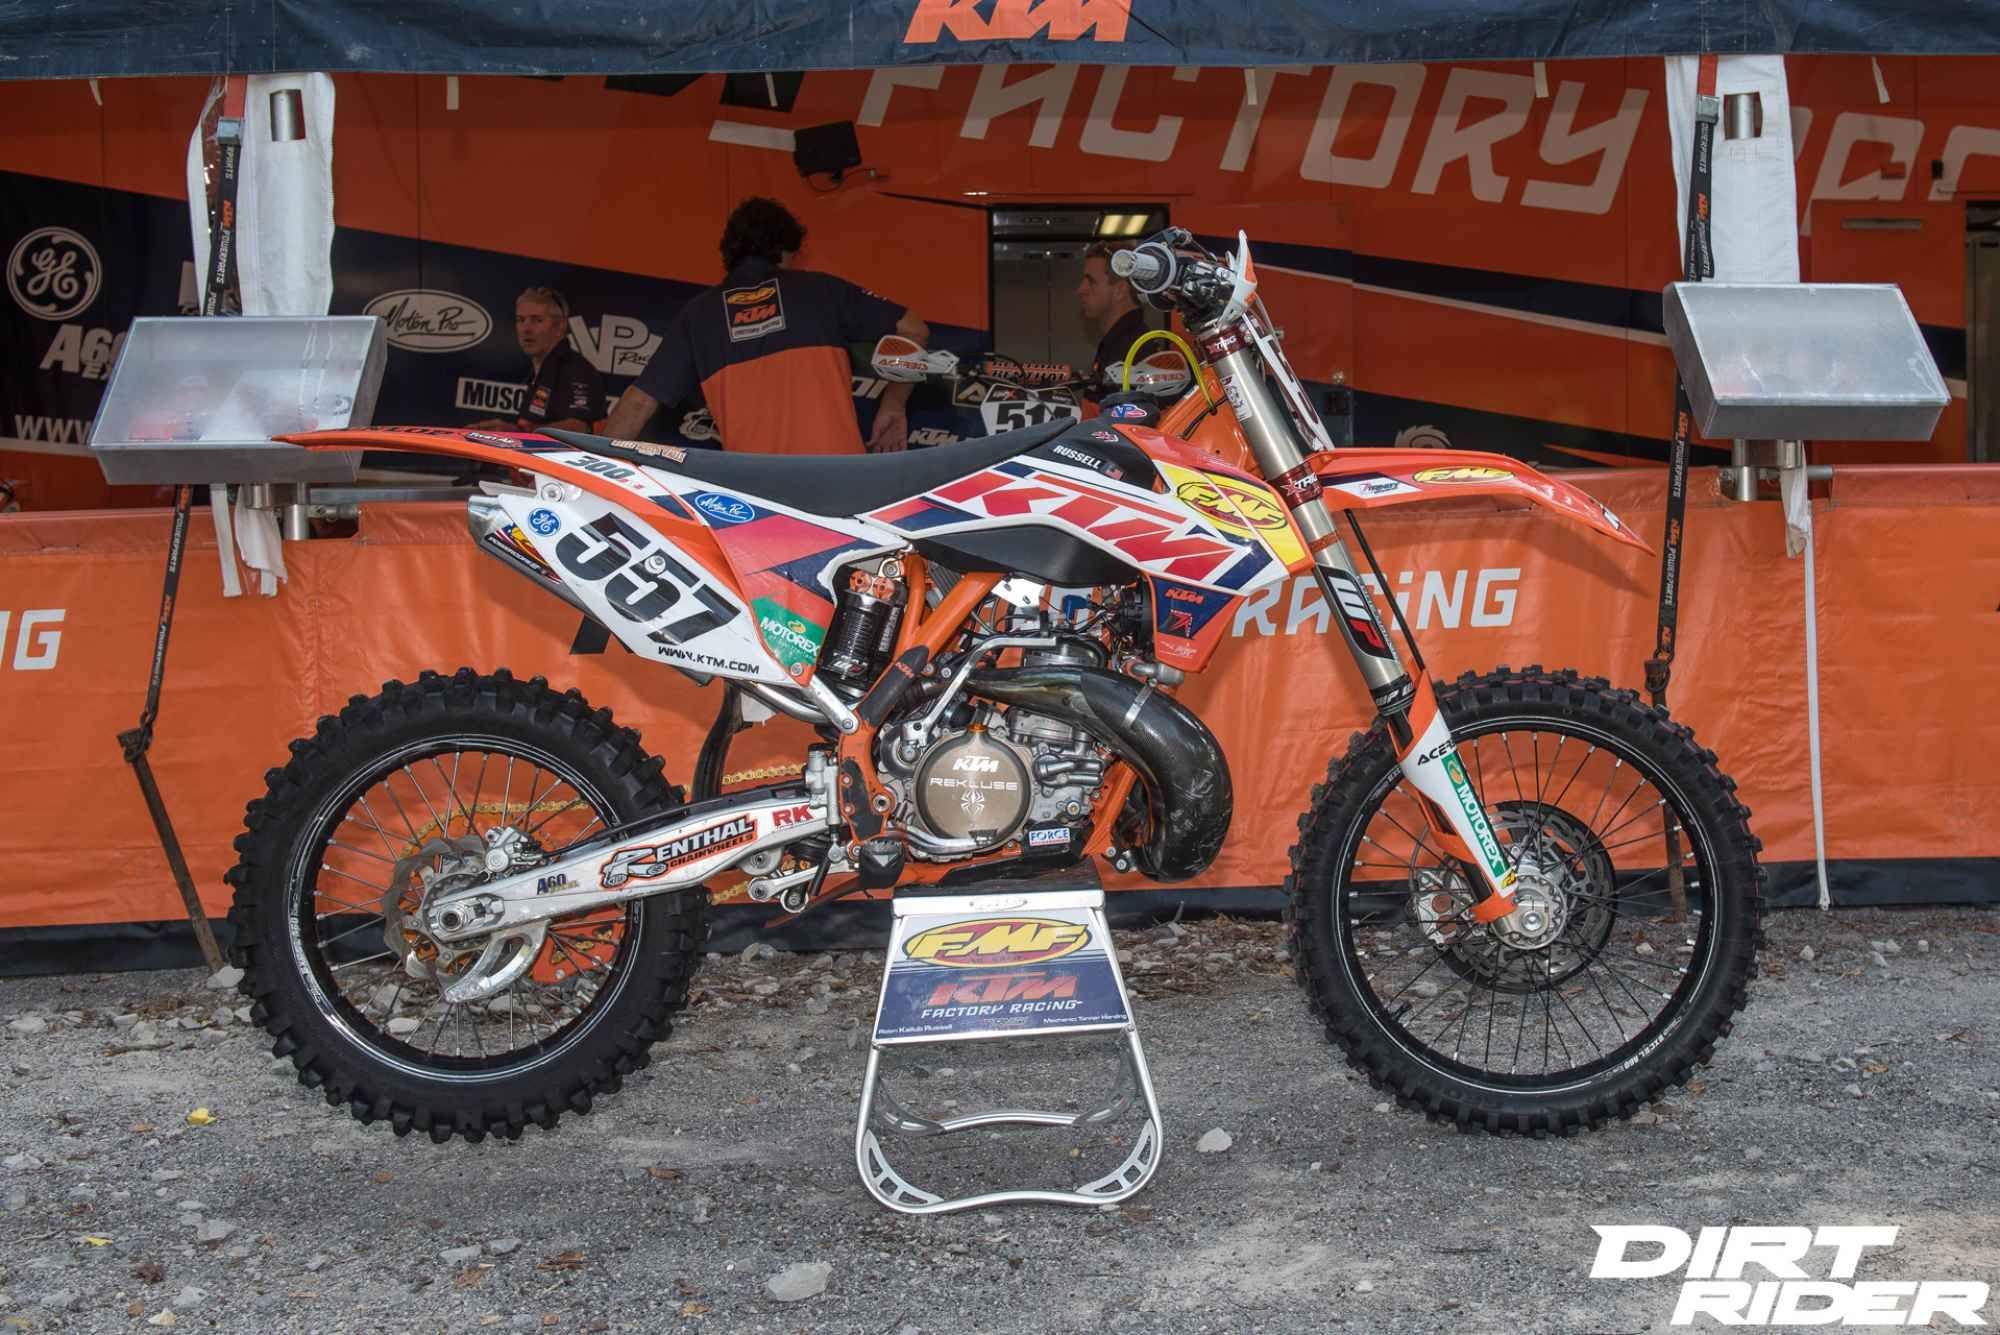 Kailub Russell S Ktm 300 Xc Factory Bike Friday Dirt Rider